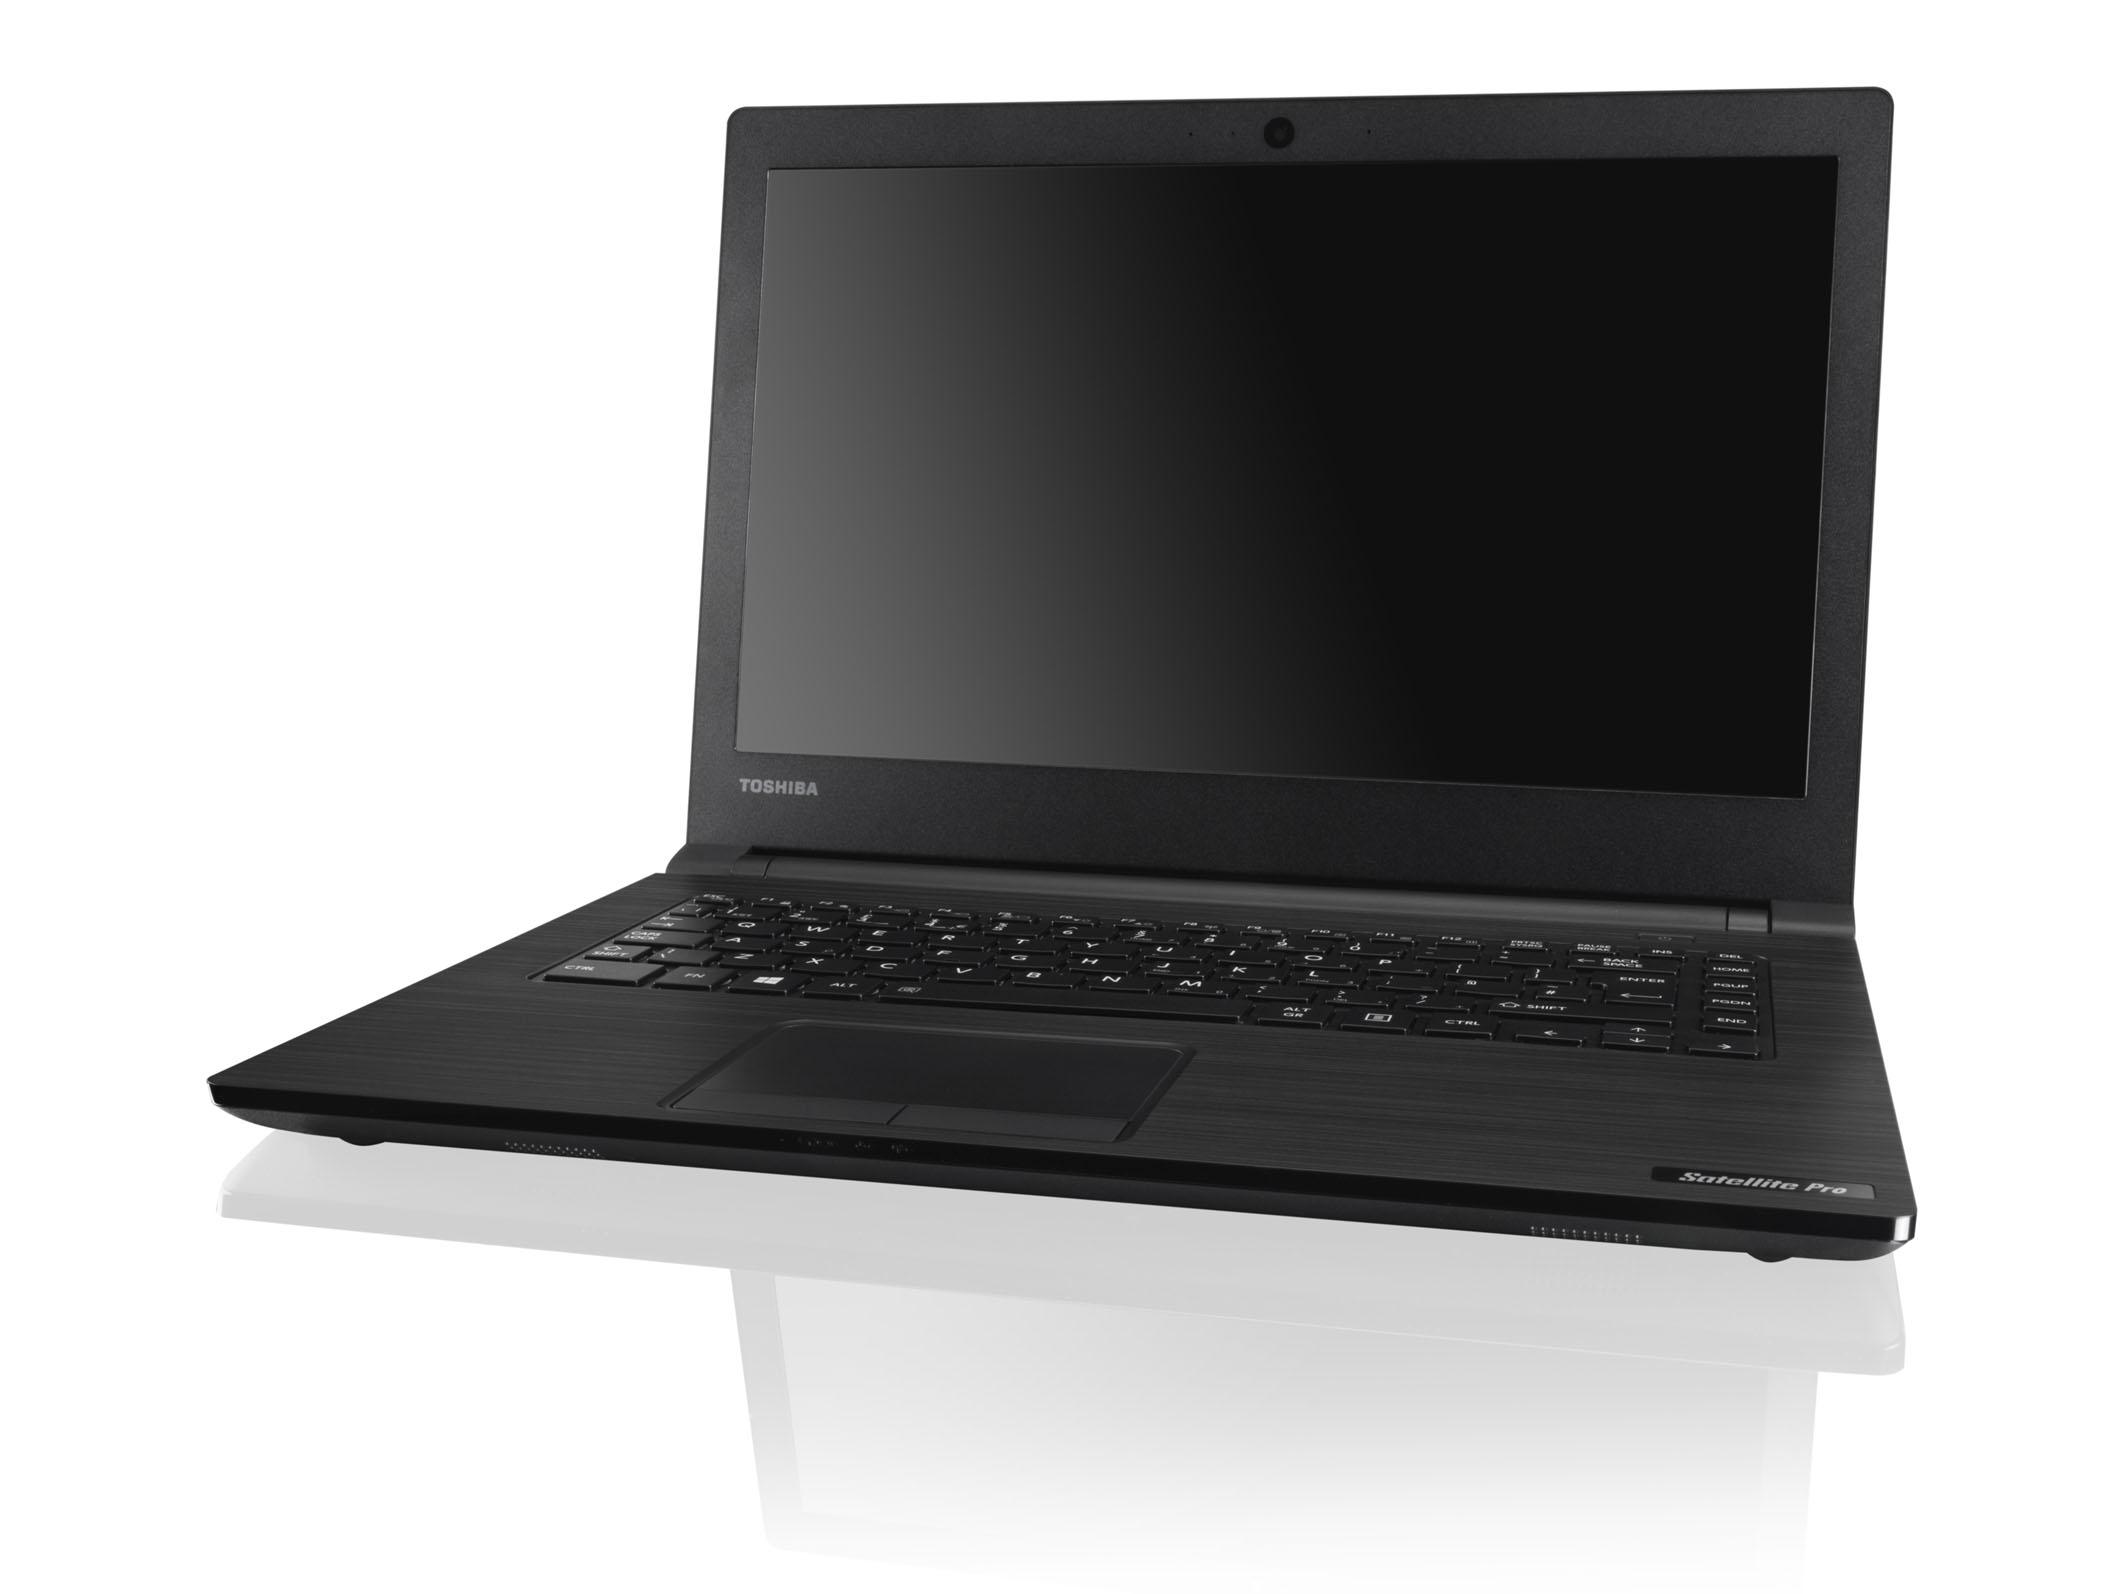 Toshiba_Satellite Pro R40 C